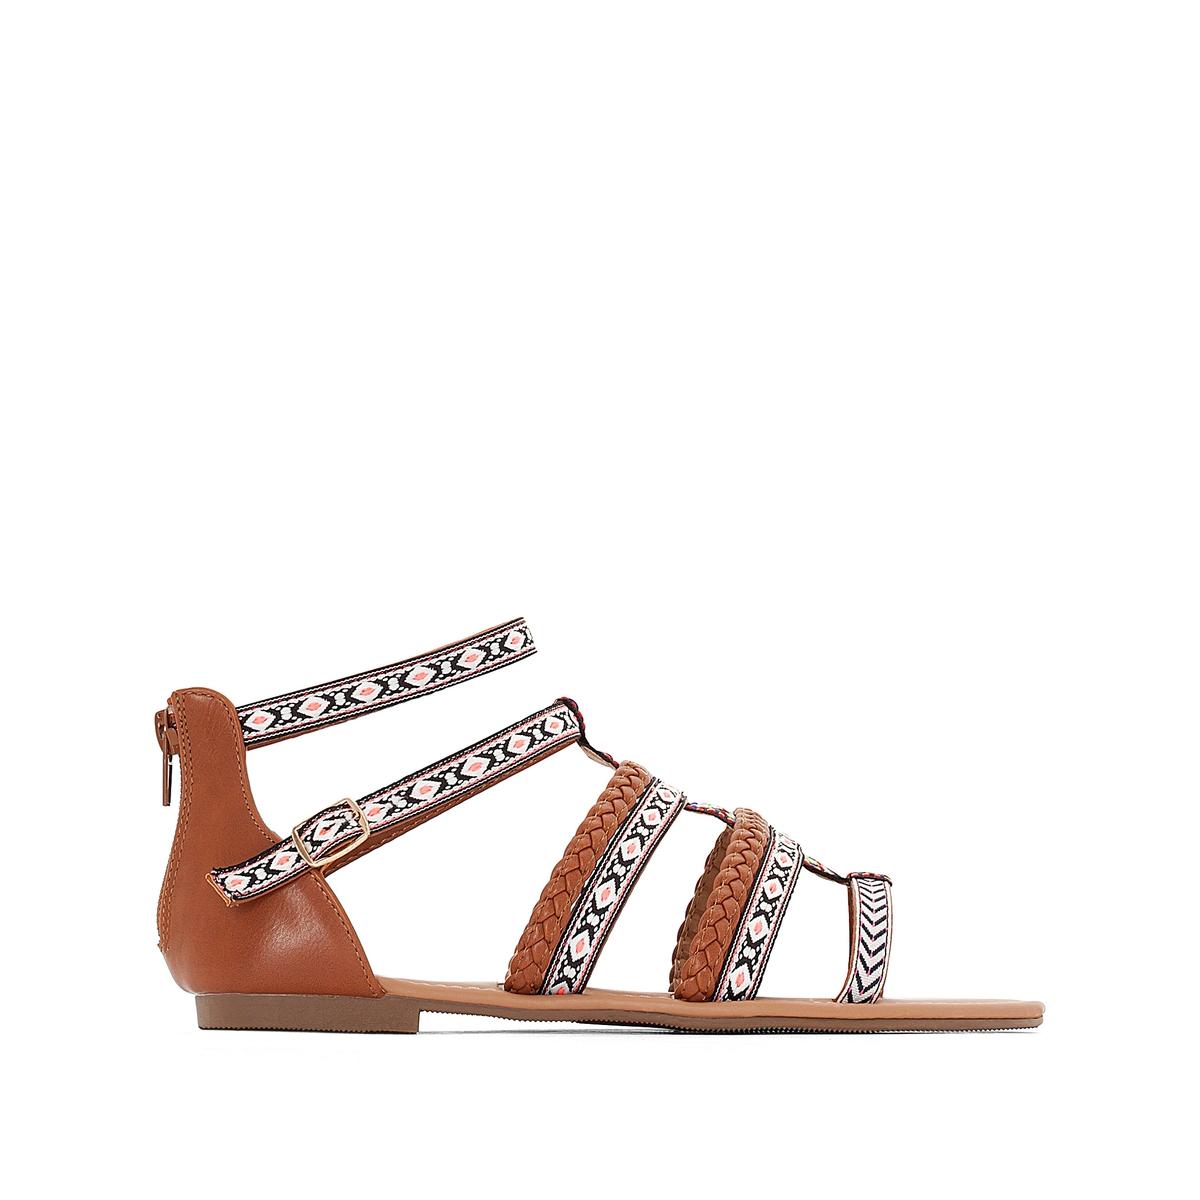 Босоножки на плоском каблуке 315721 цены онлайн